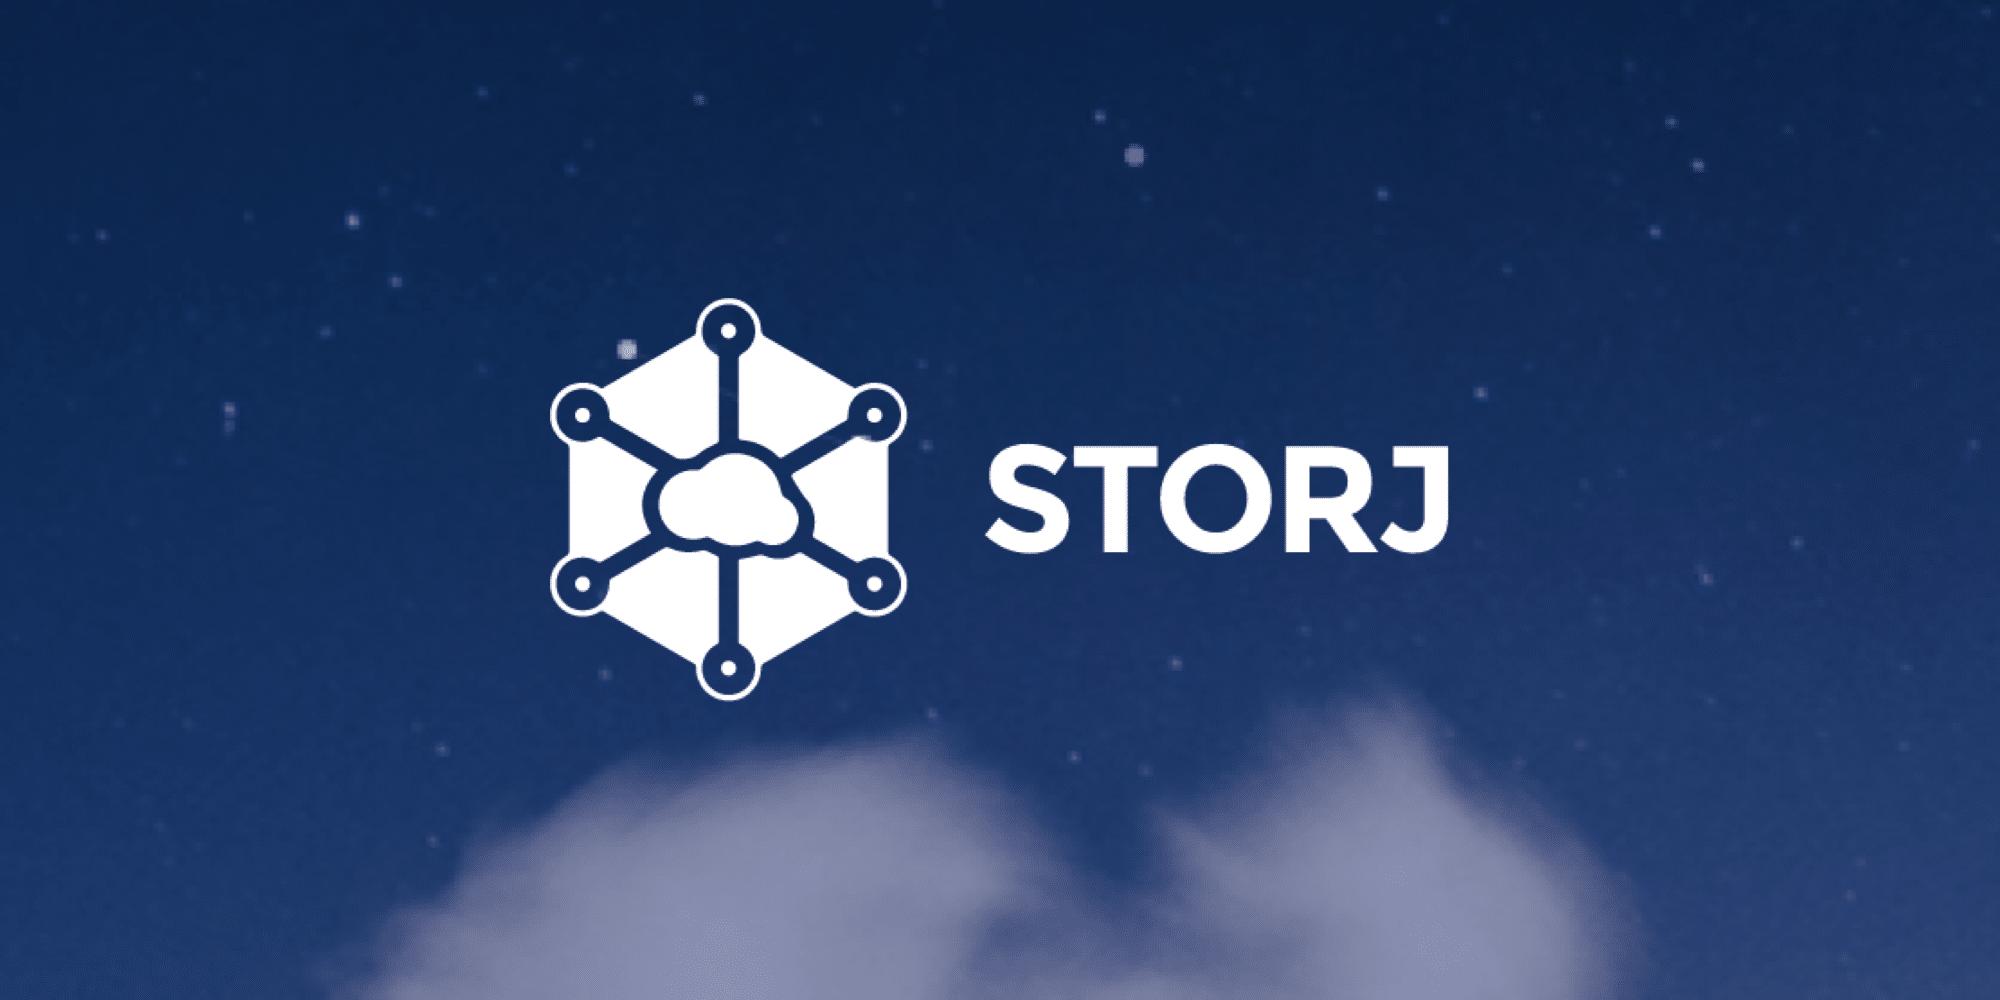 Логотип проекта Storj